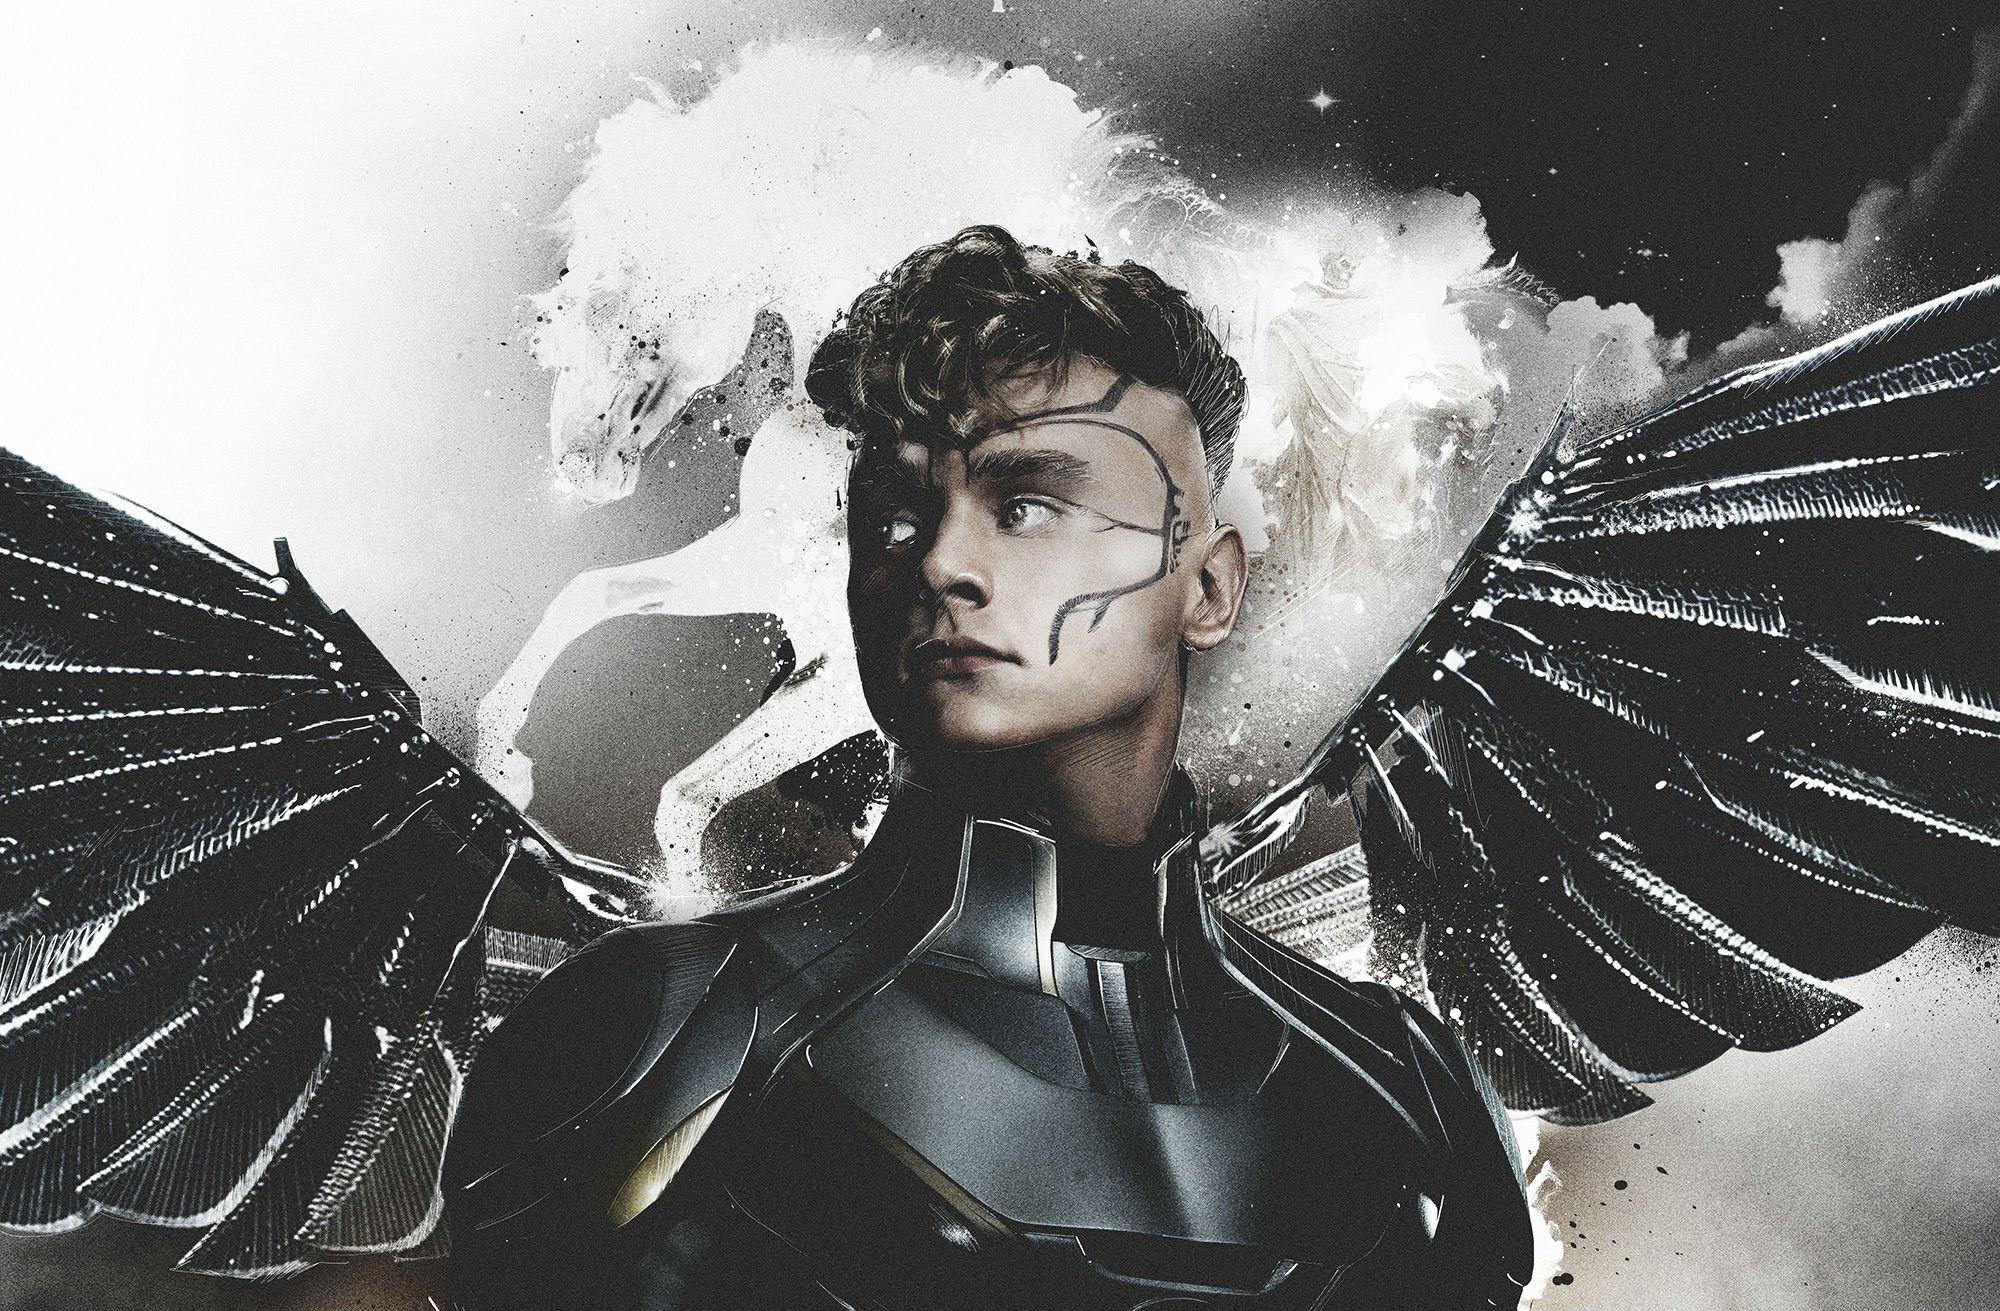 X Men Apocalypse Wallpapers Movie Trailers Photo 40092410